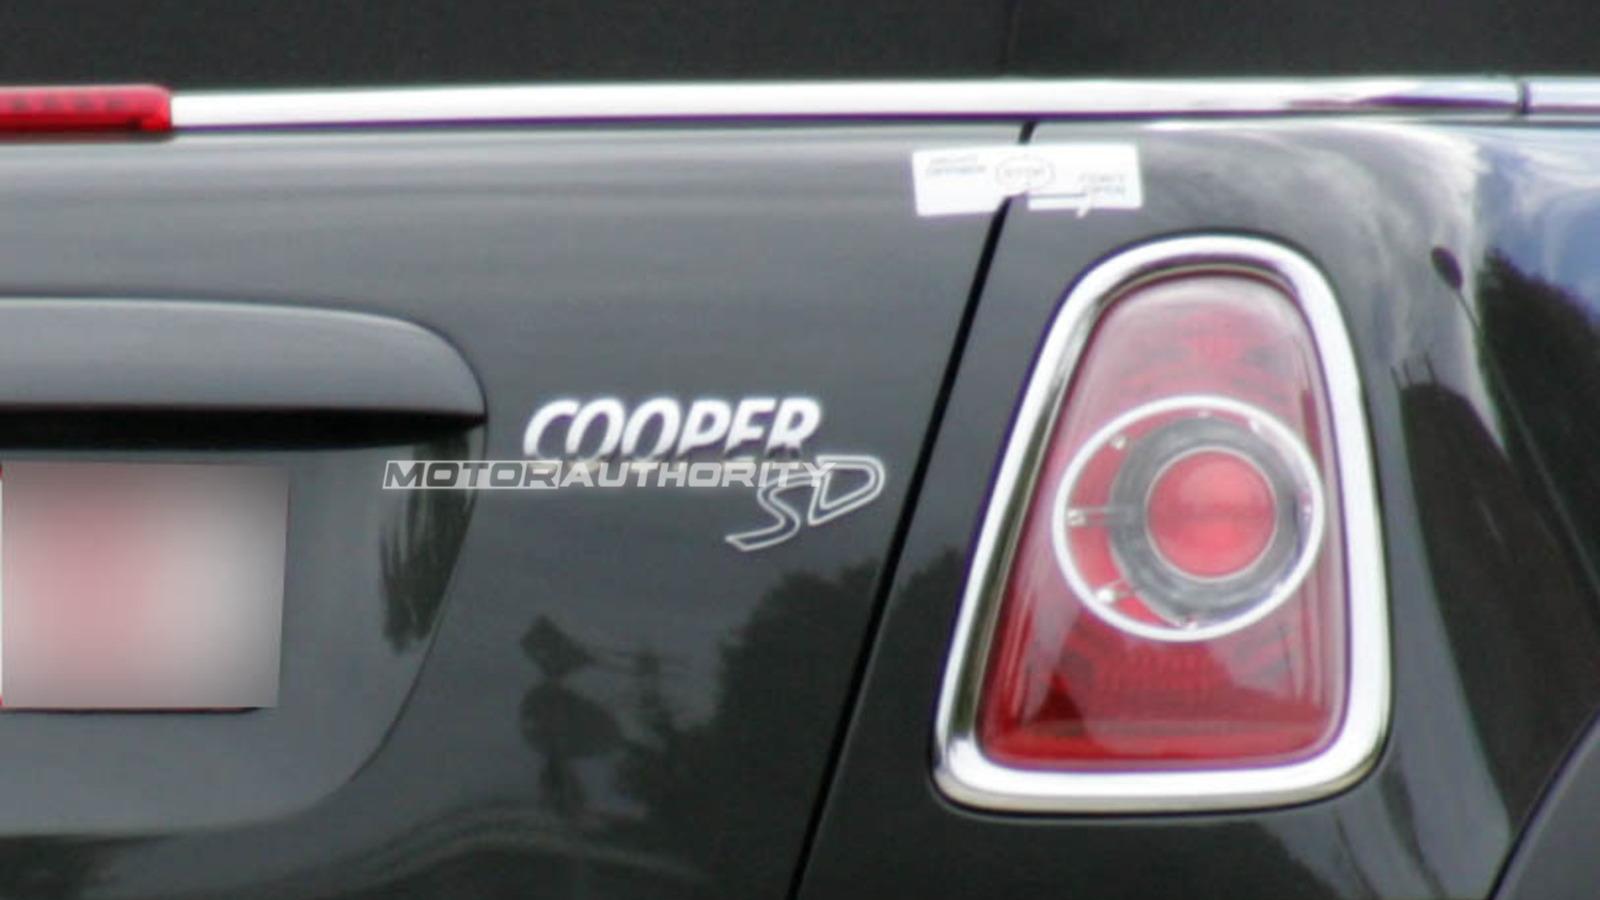 2012 MINI Cooper Diesel S spy shots